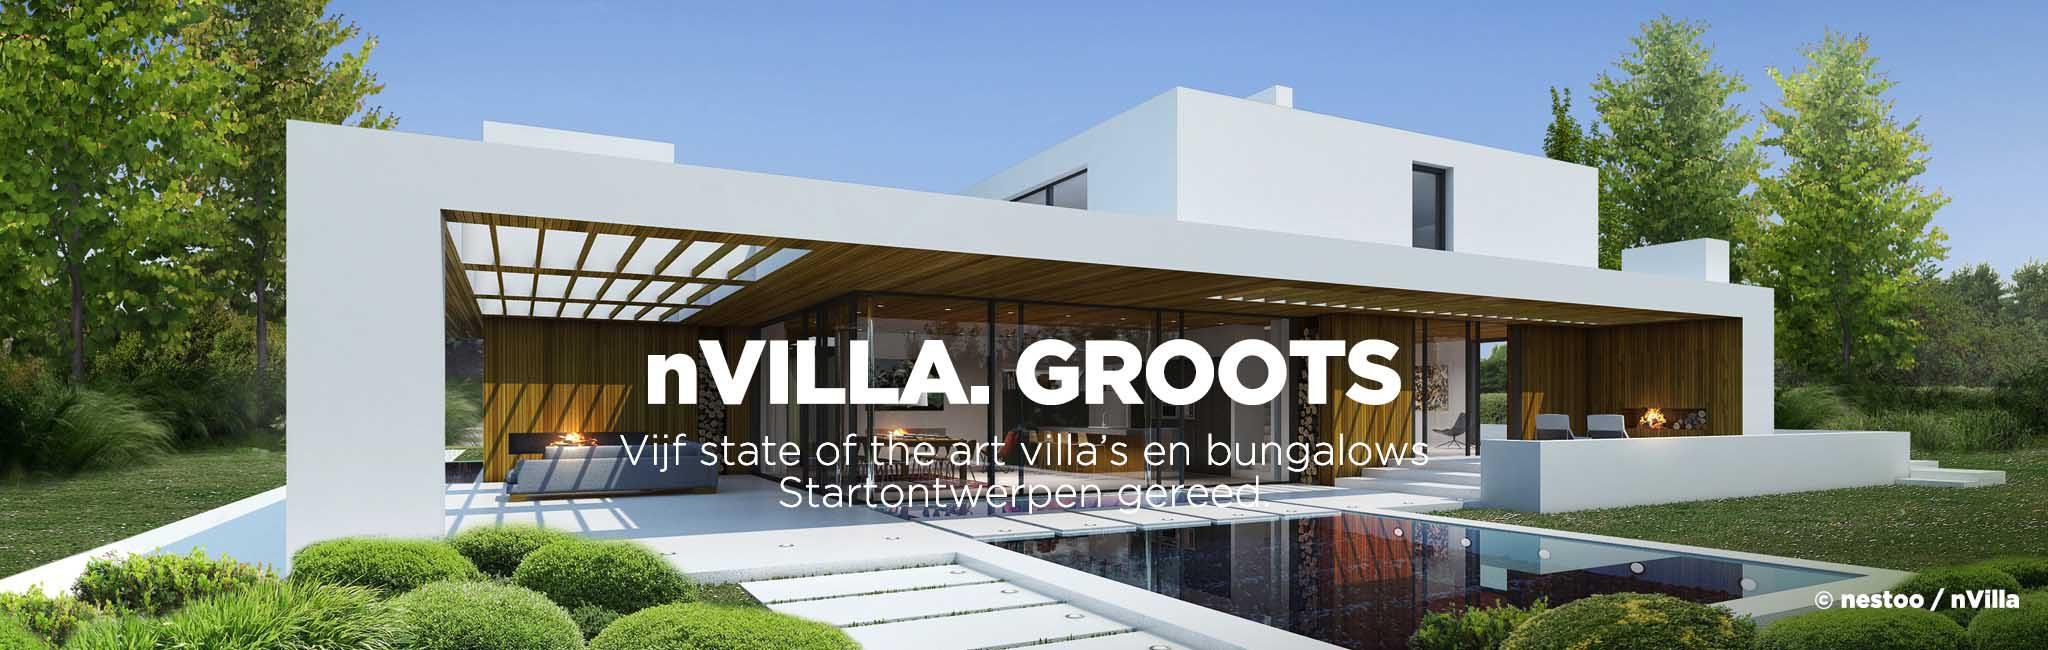 Home nestoo for Moderne villa architectuur